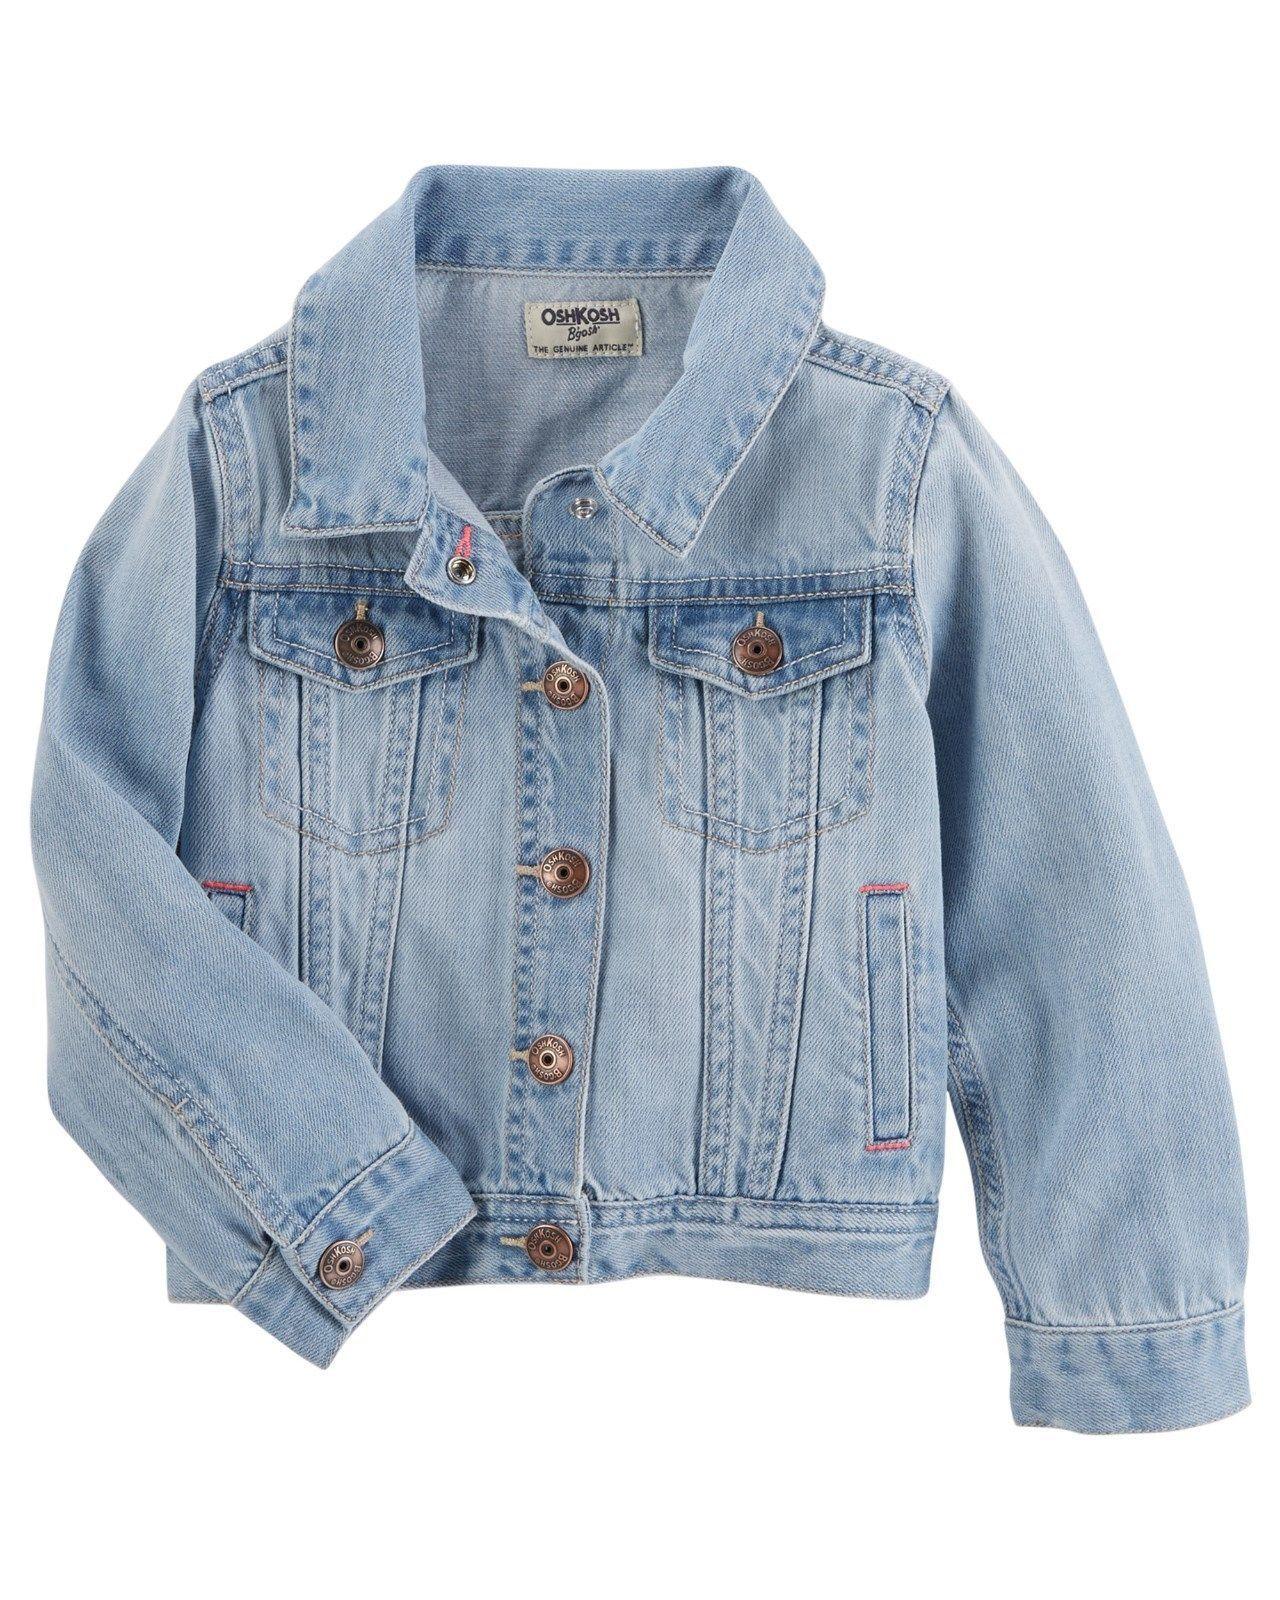 e1c2e2a95 OshKosh B gosh Outerwear  ebay  Fashion